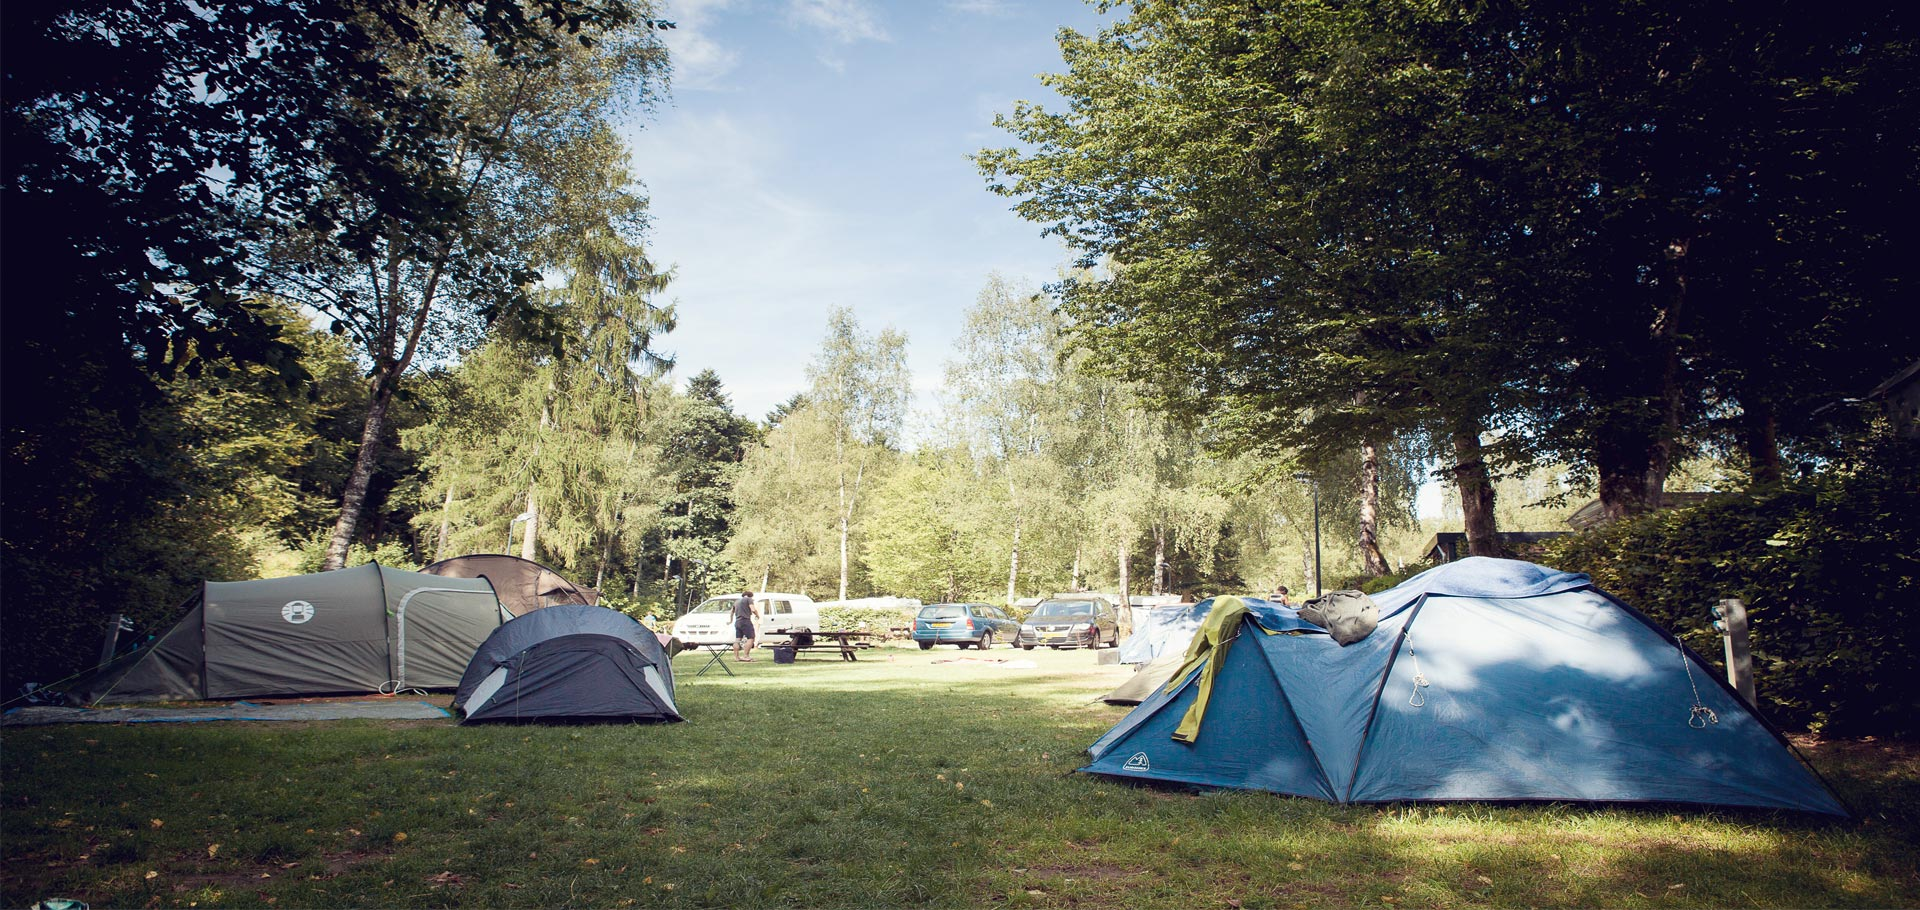 Camping_Martbusch_Berdorf_Luxemburg_Ueber_Uns_01